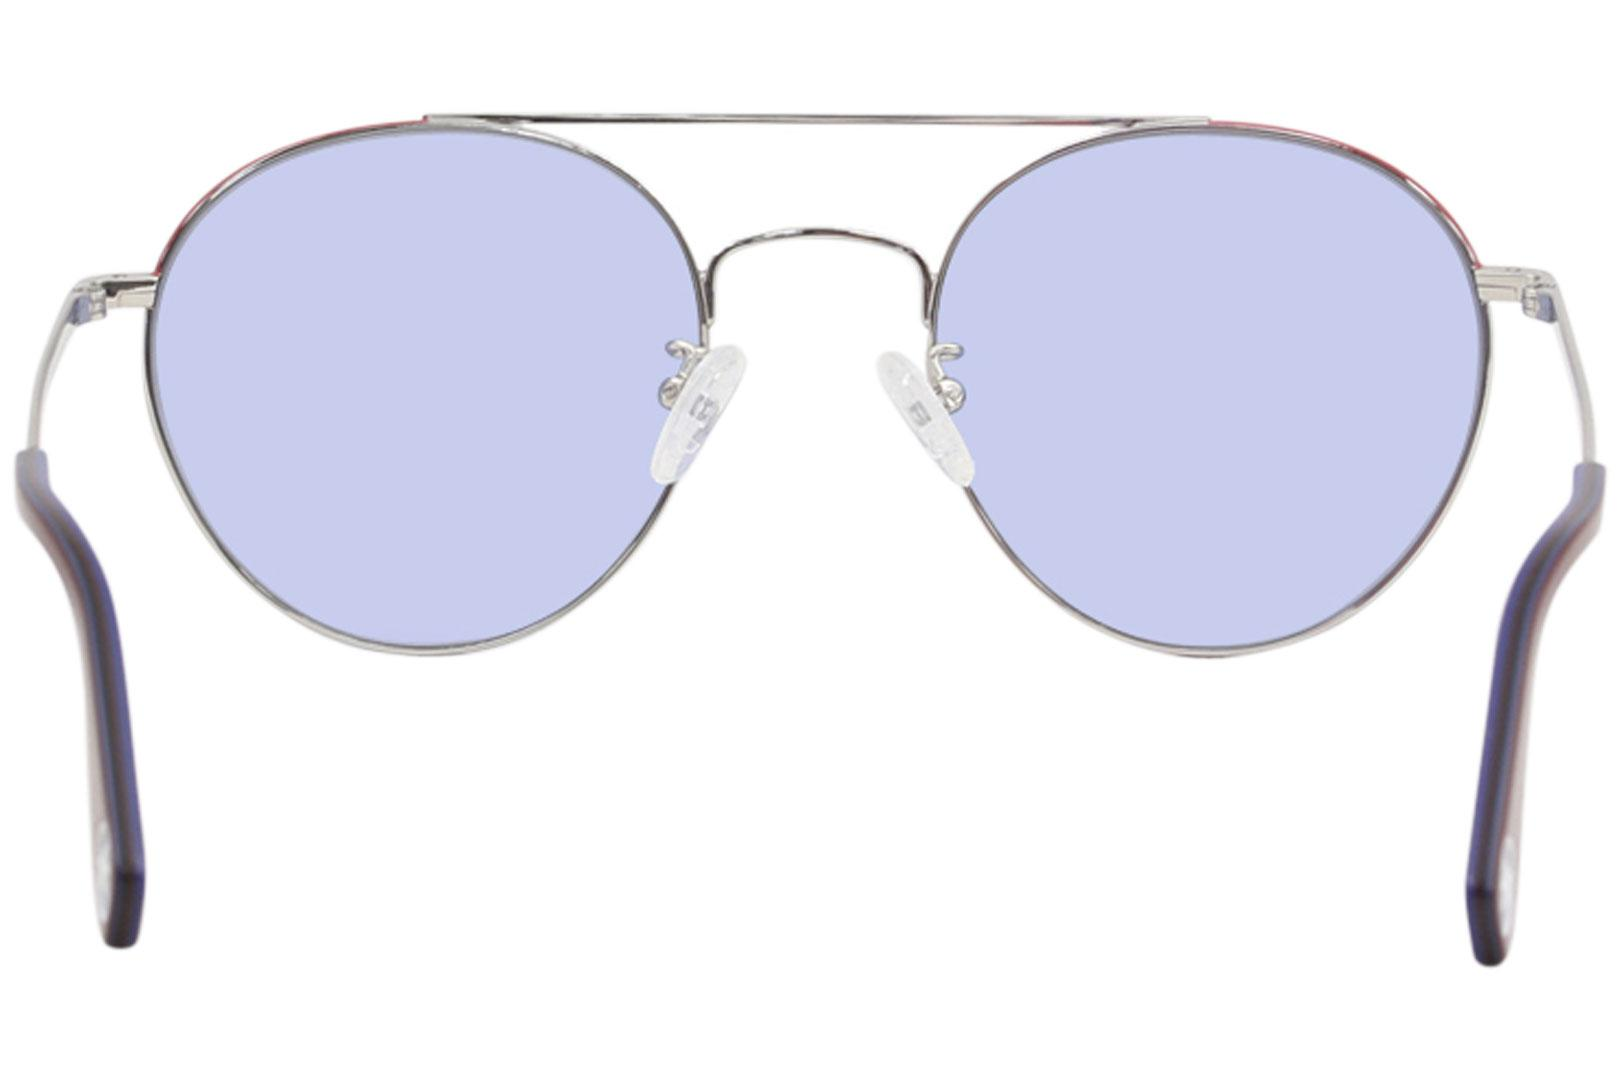 ebe473b0855 Converse Unisex SCO057 SCO 057 Fashion Pilot Sunglasses by Converse. Touch  to zoom